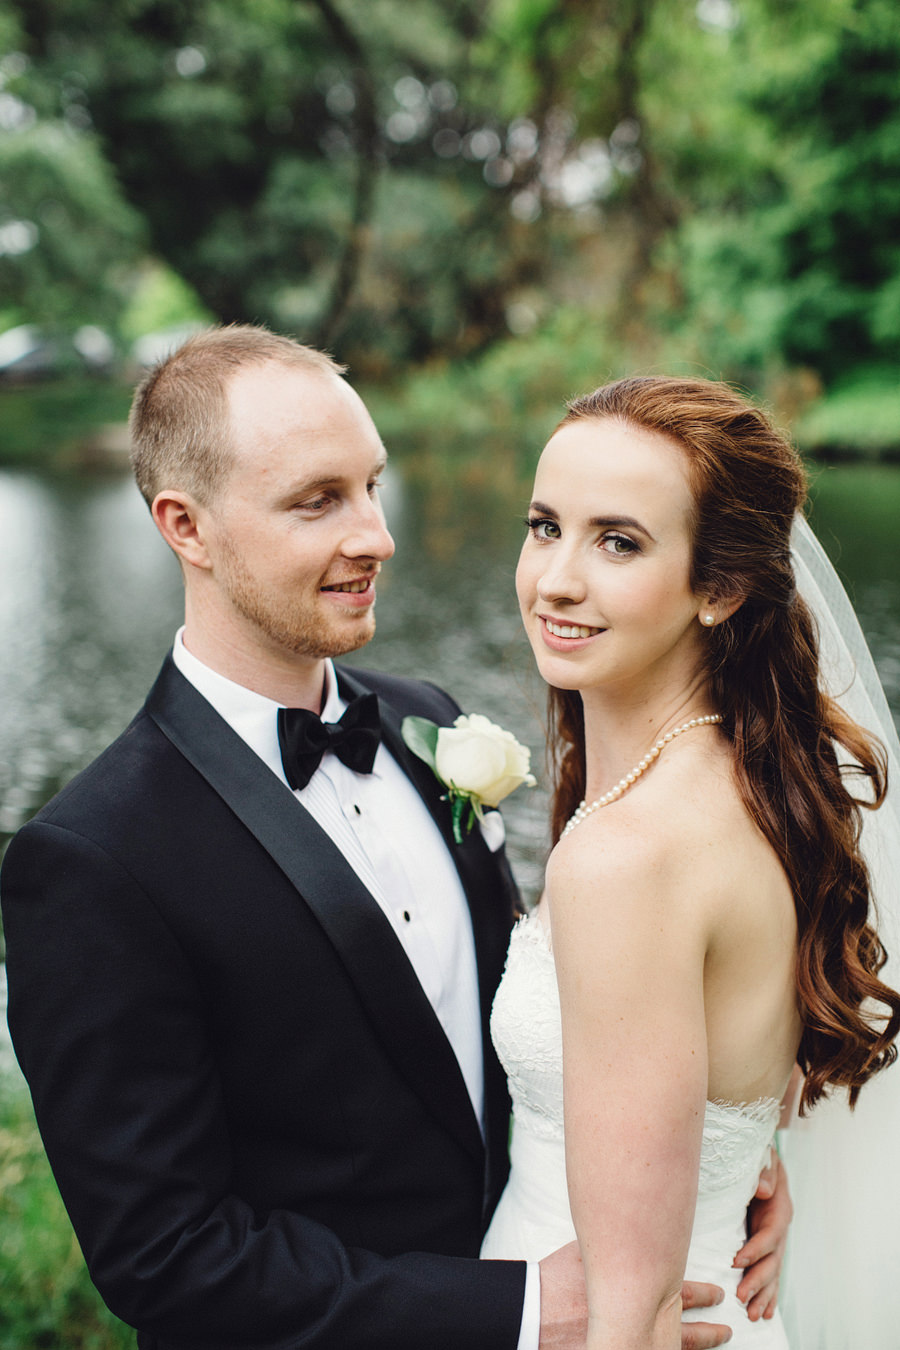 Sydney Wedding Photography: Bridal Party Portraits